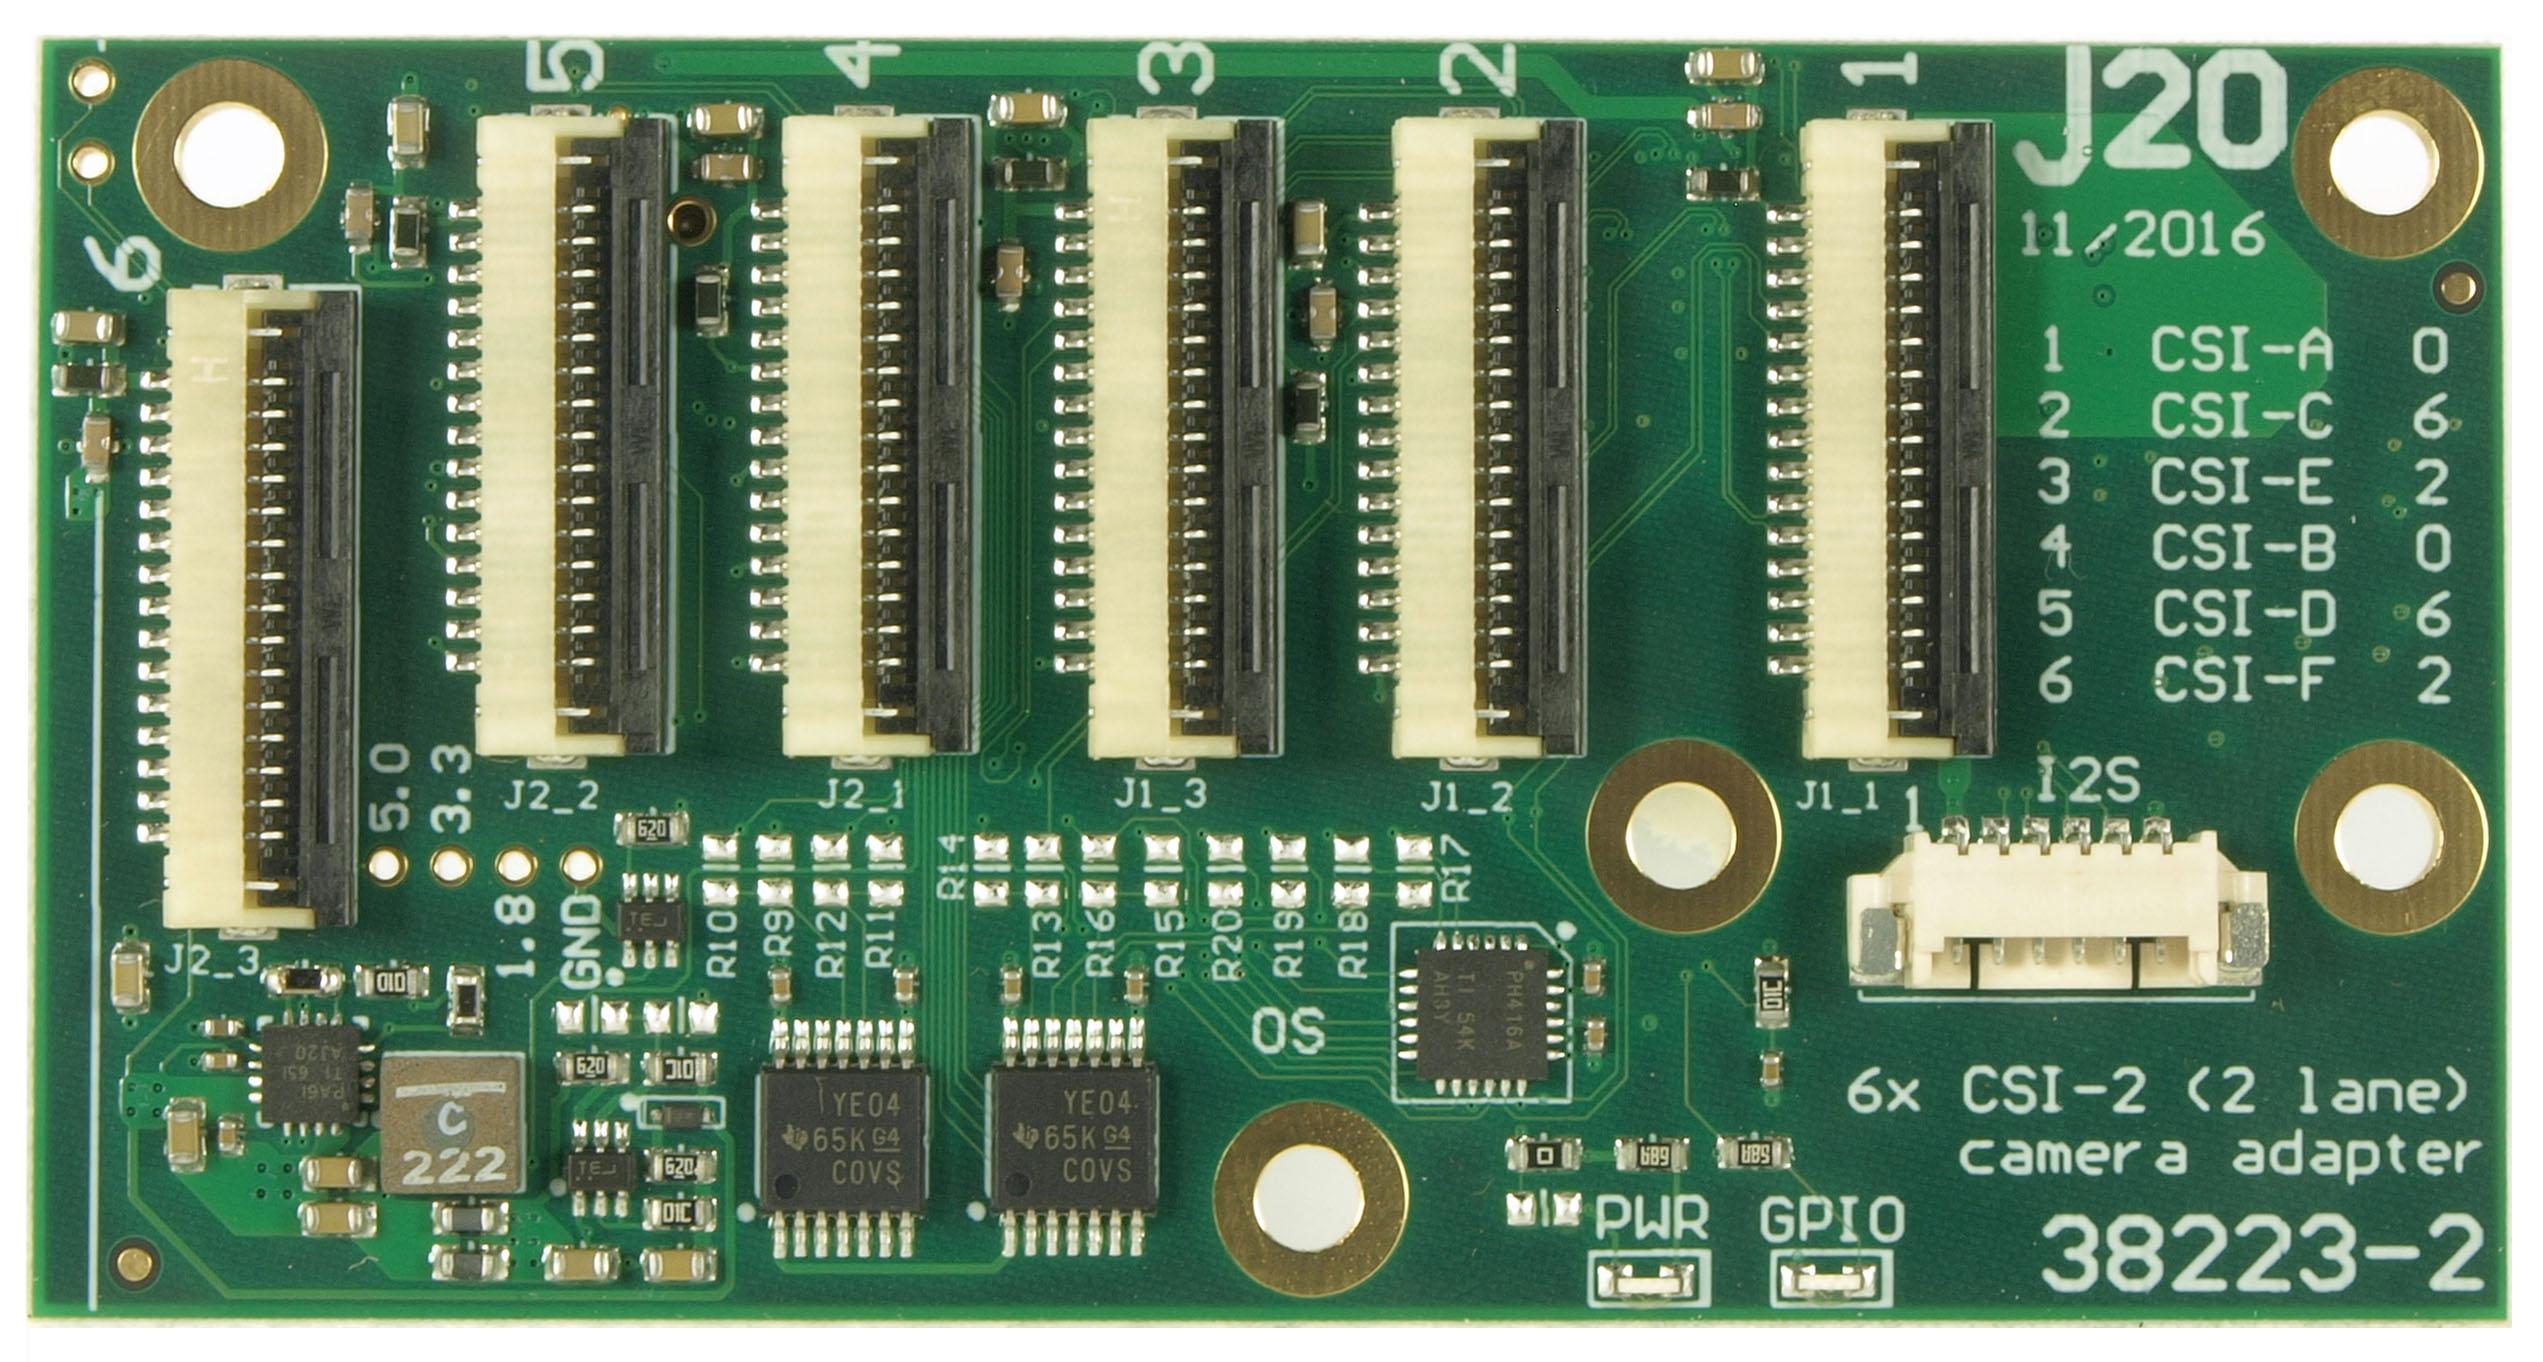 J20 add-on module for the Jetson TX1 development kit